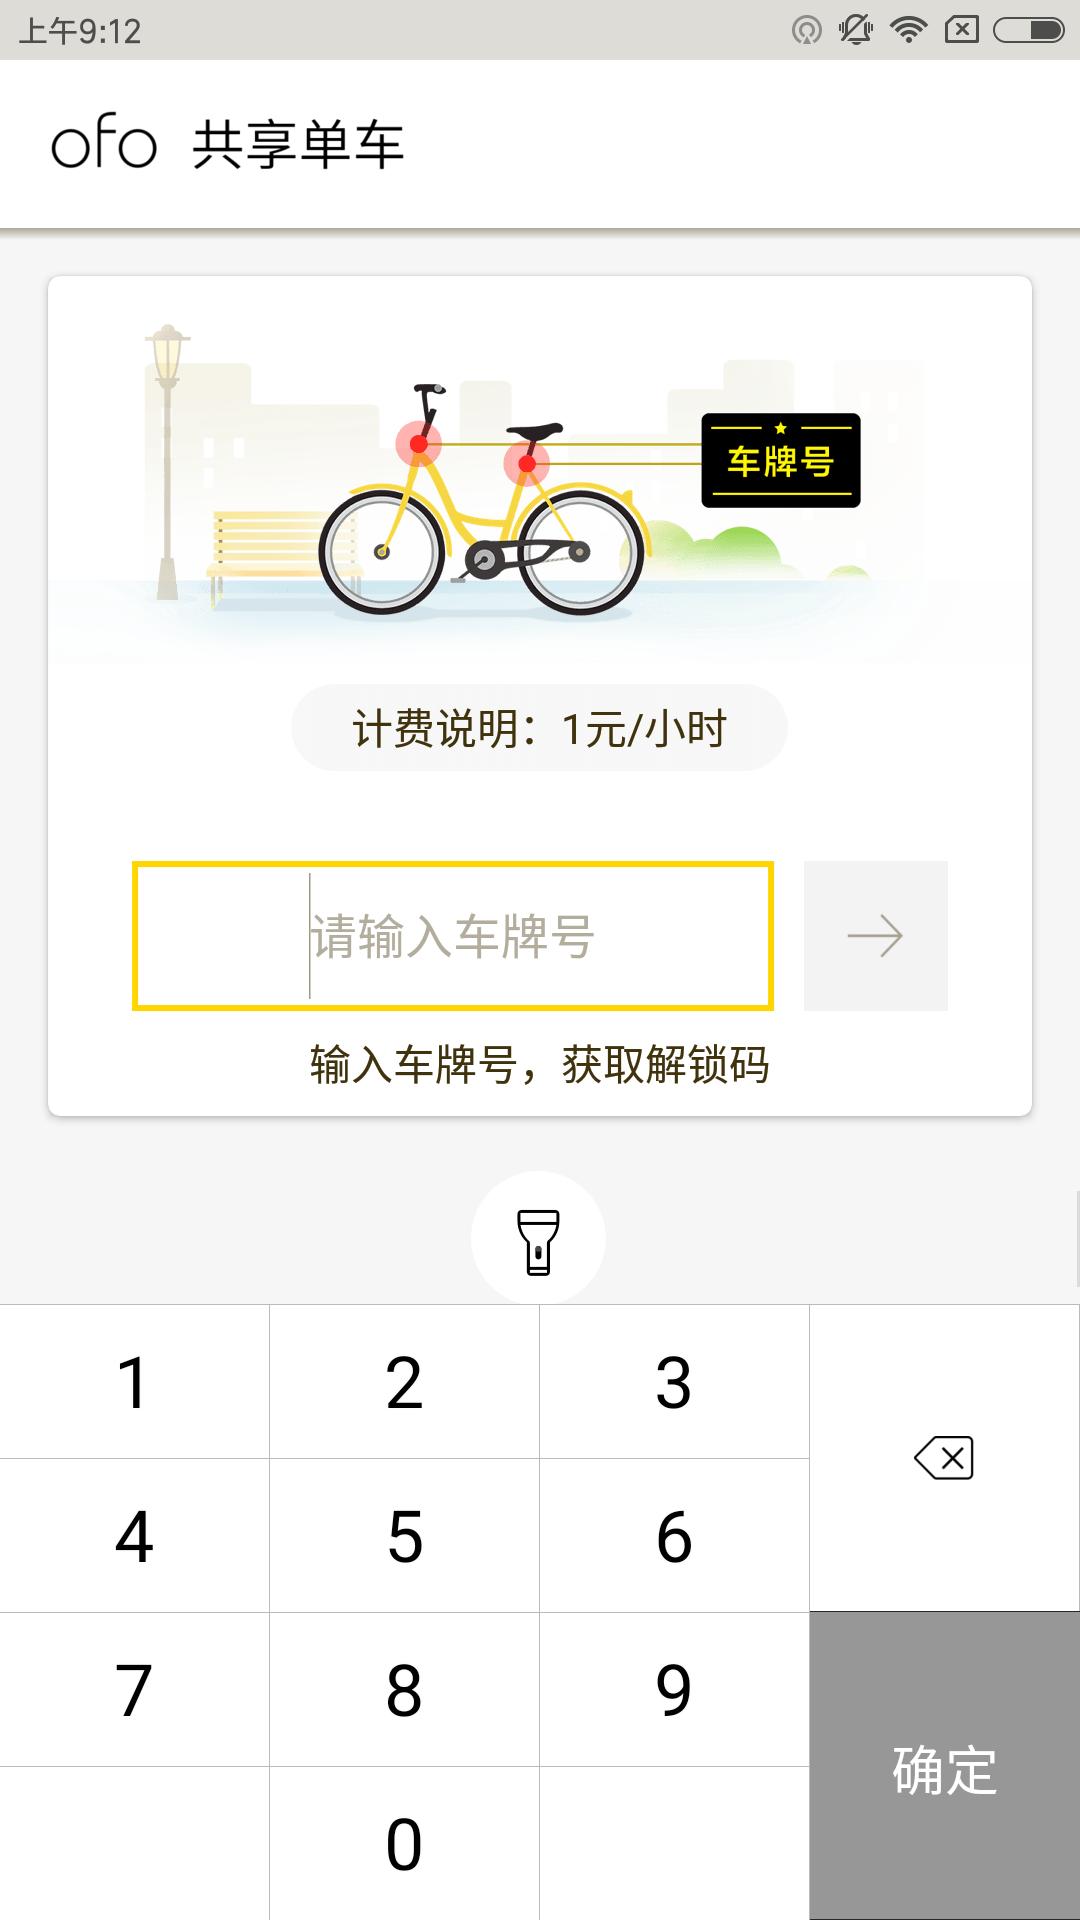 ofo共享单车手机版下载_ofo共享单车最新版下